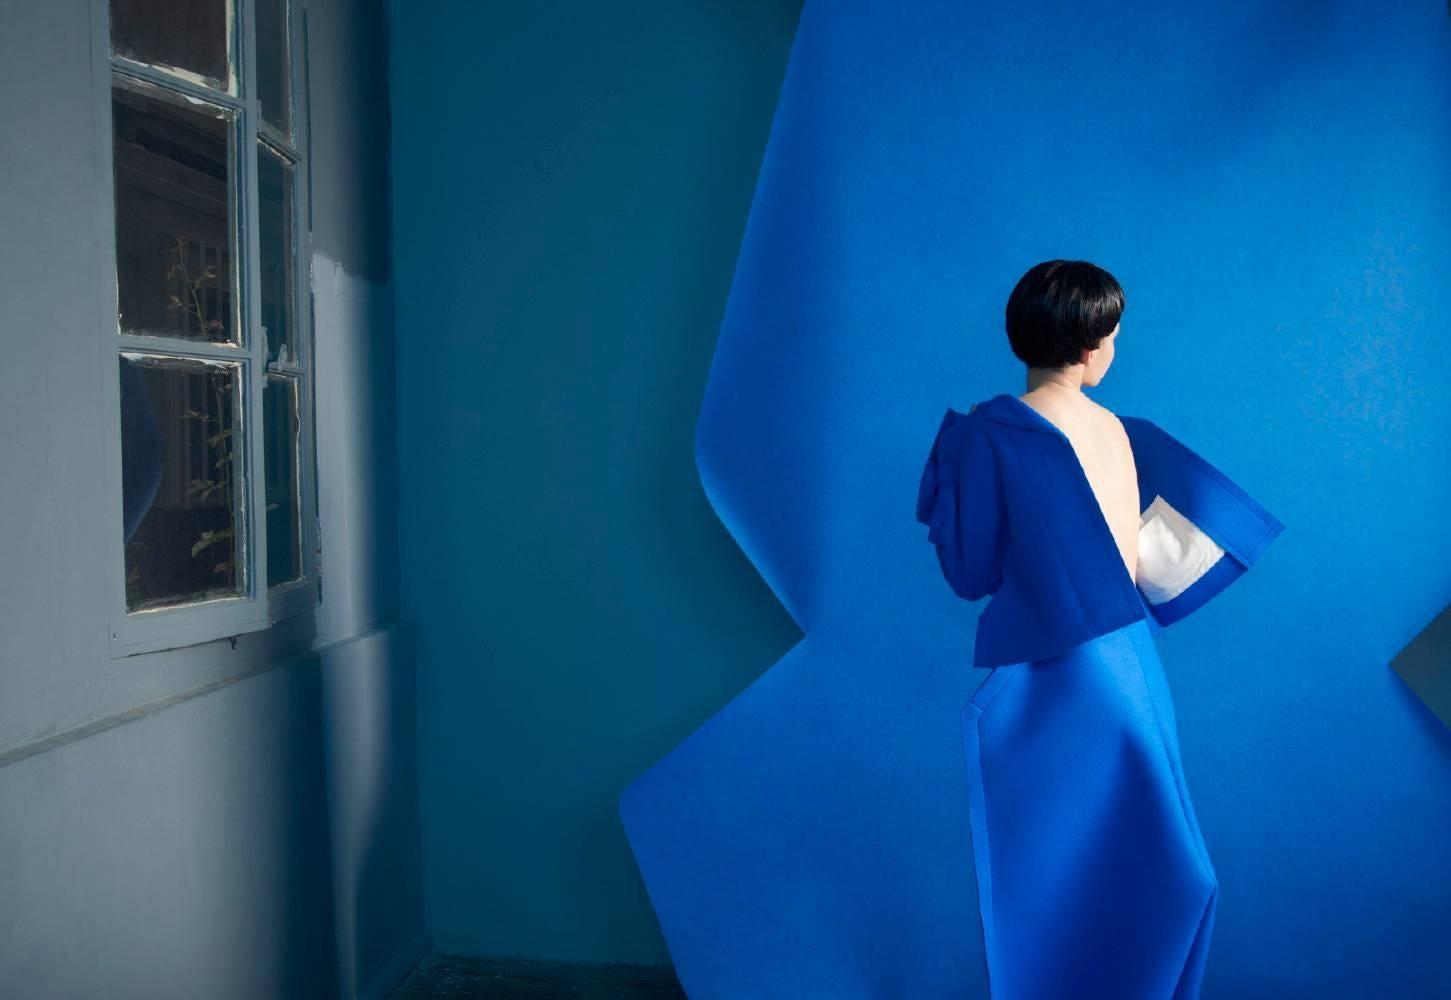 women, blue color, paper Theater #2